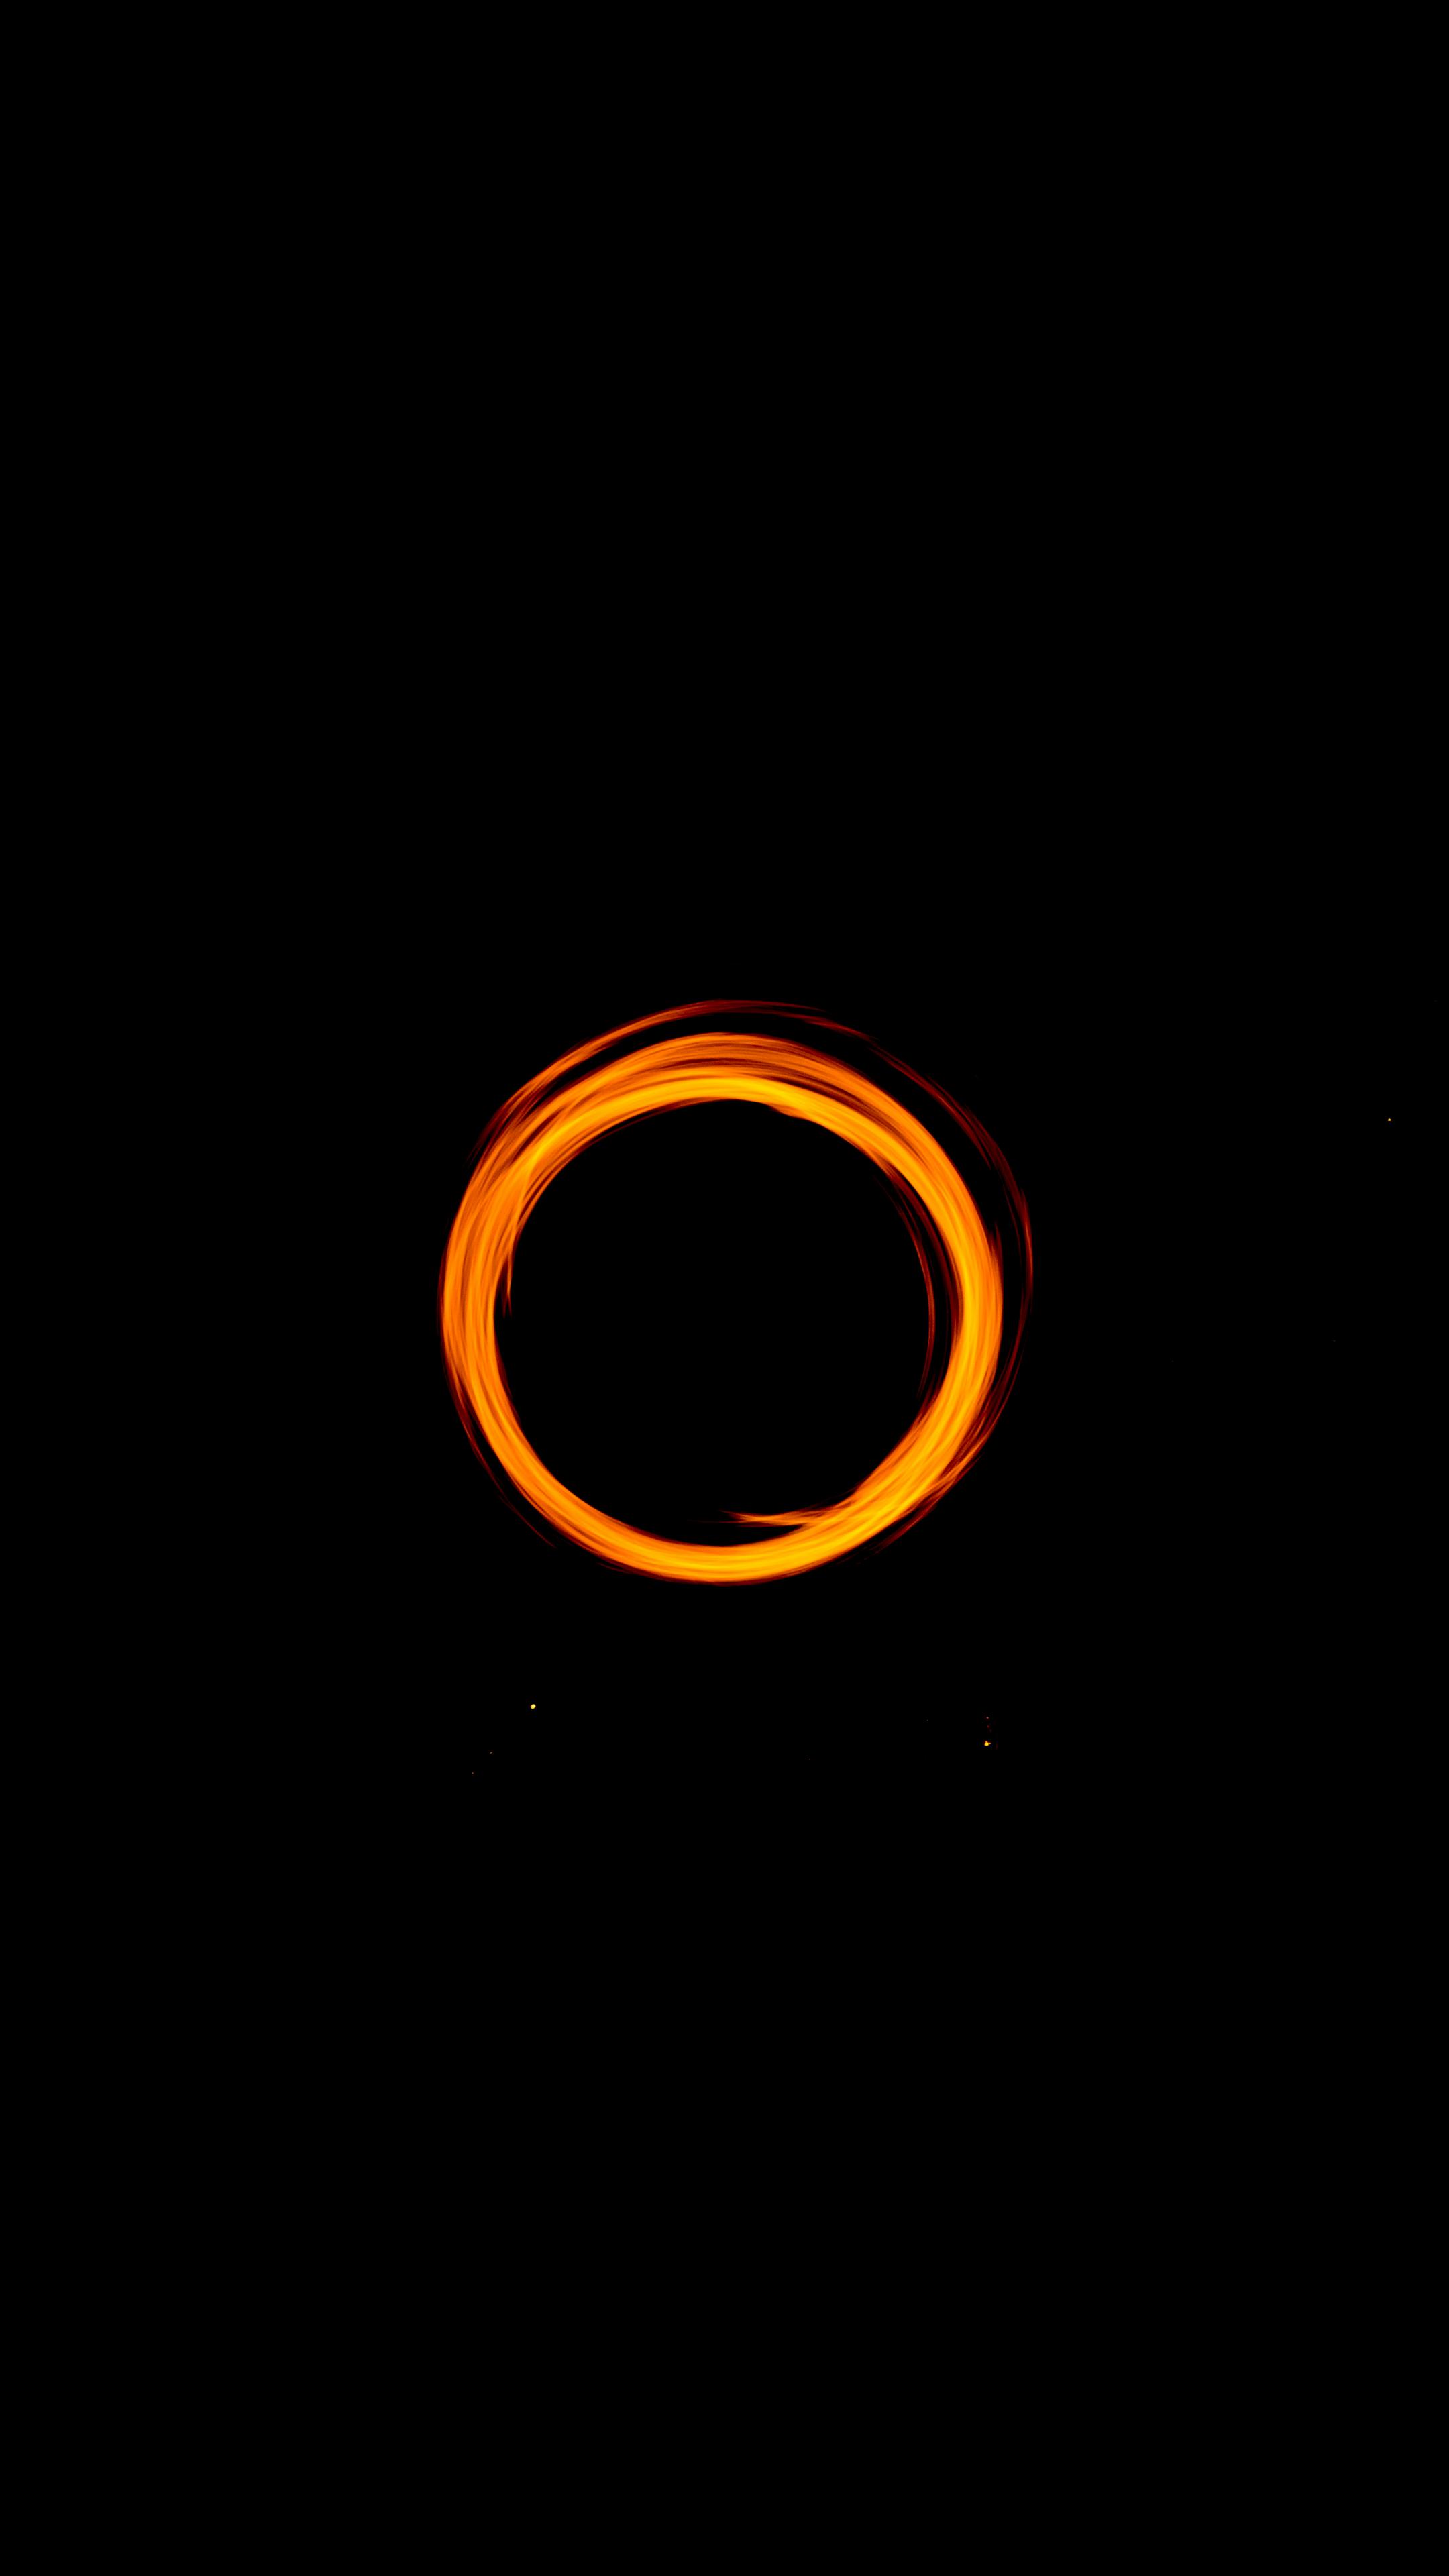 Orange Circle Ring Dark Wallpaper Cover Wallpaper Black Wallpaper